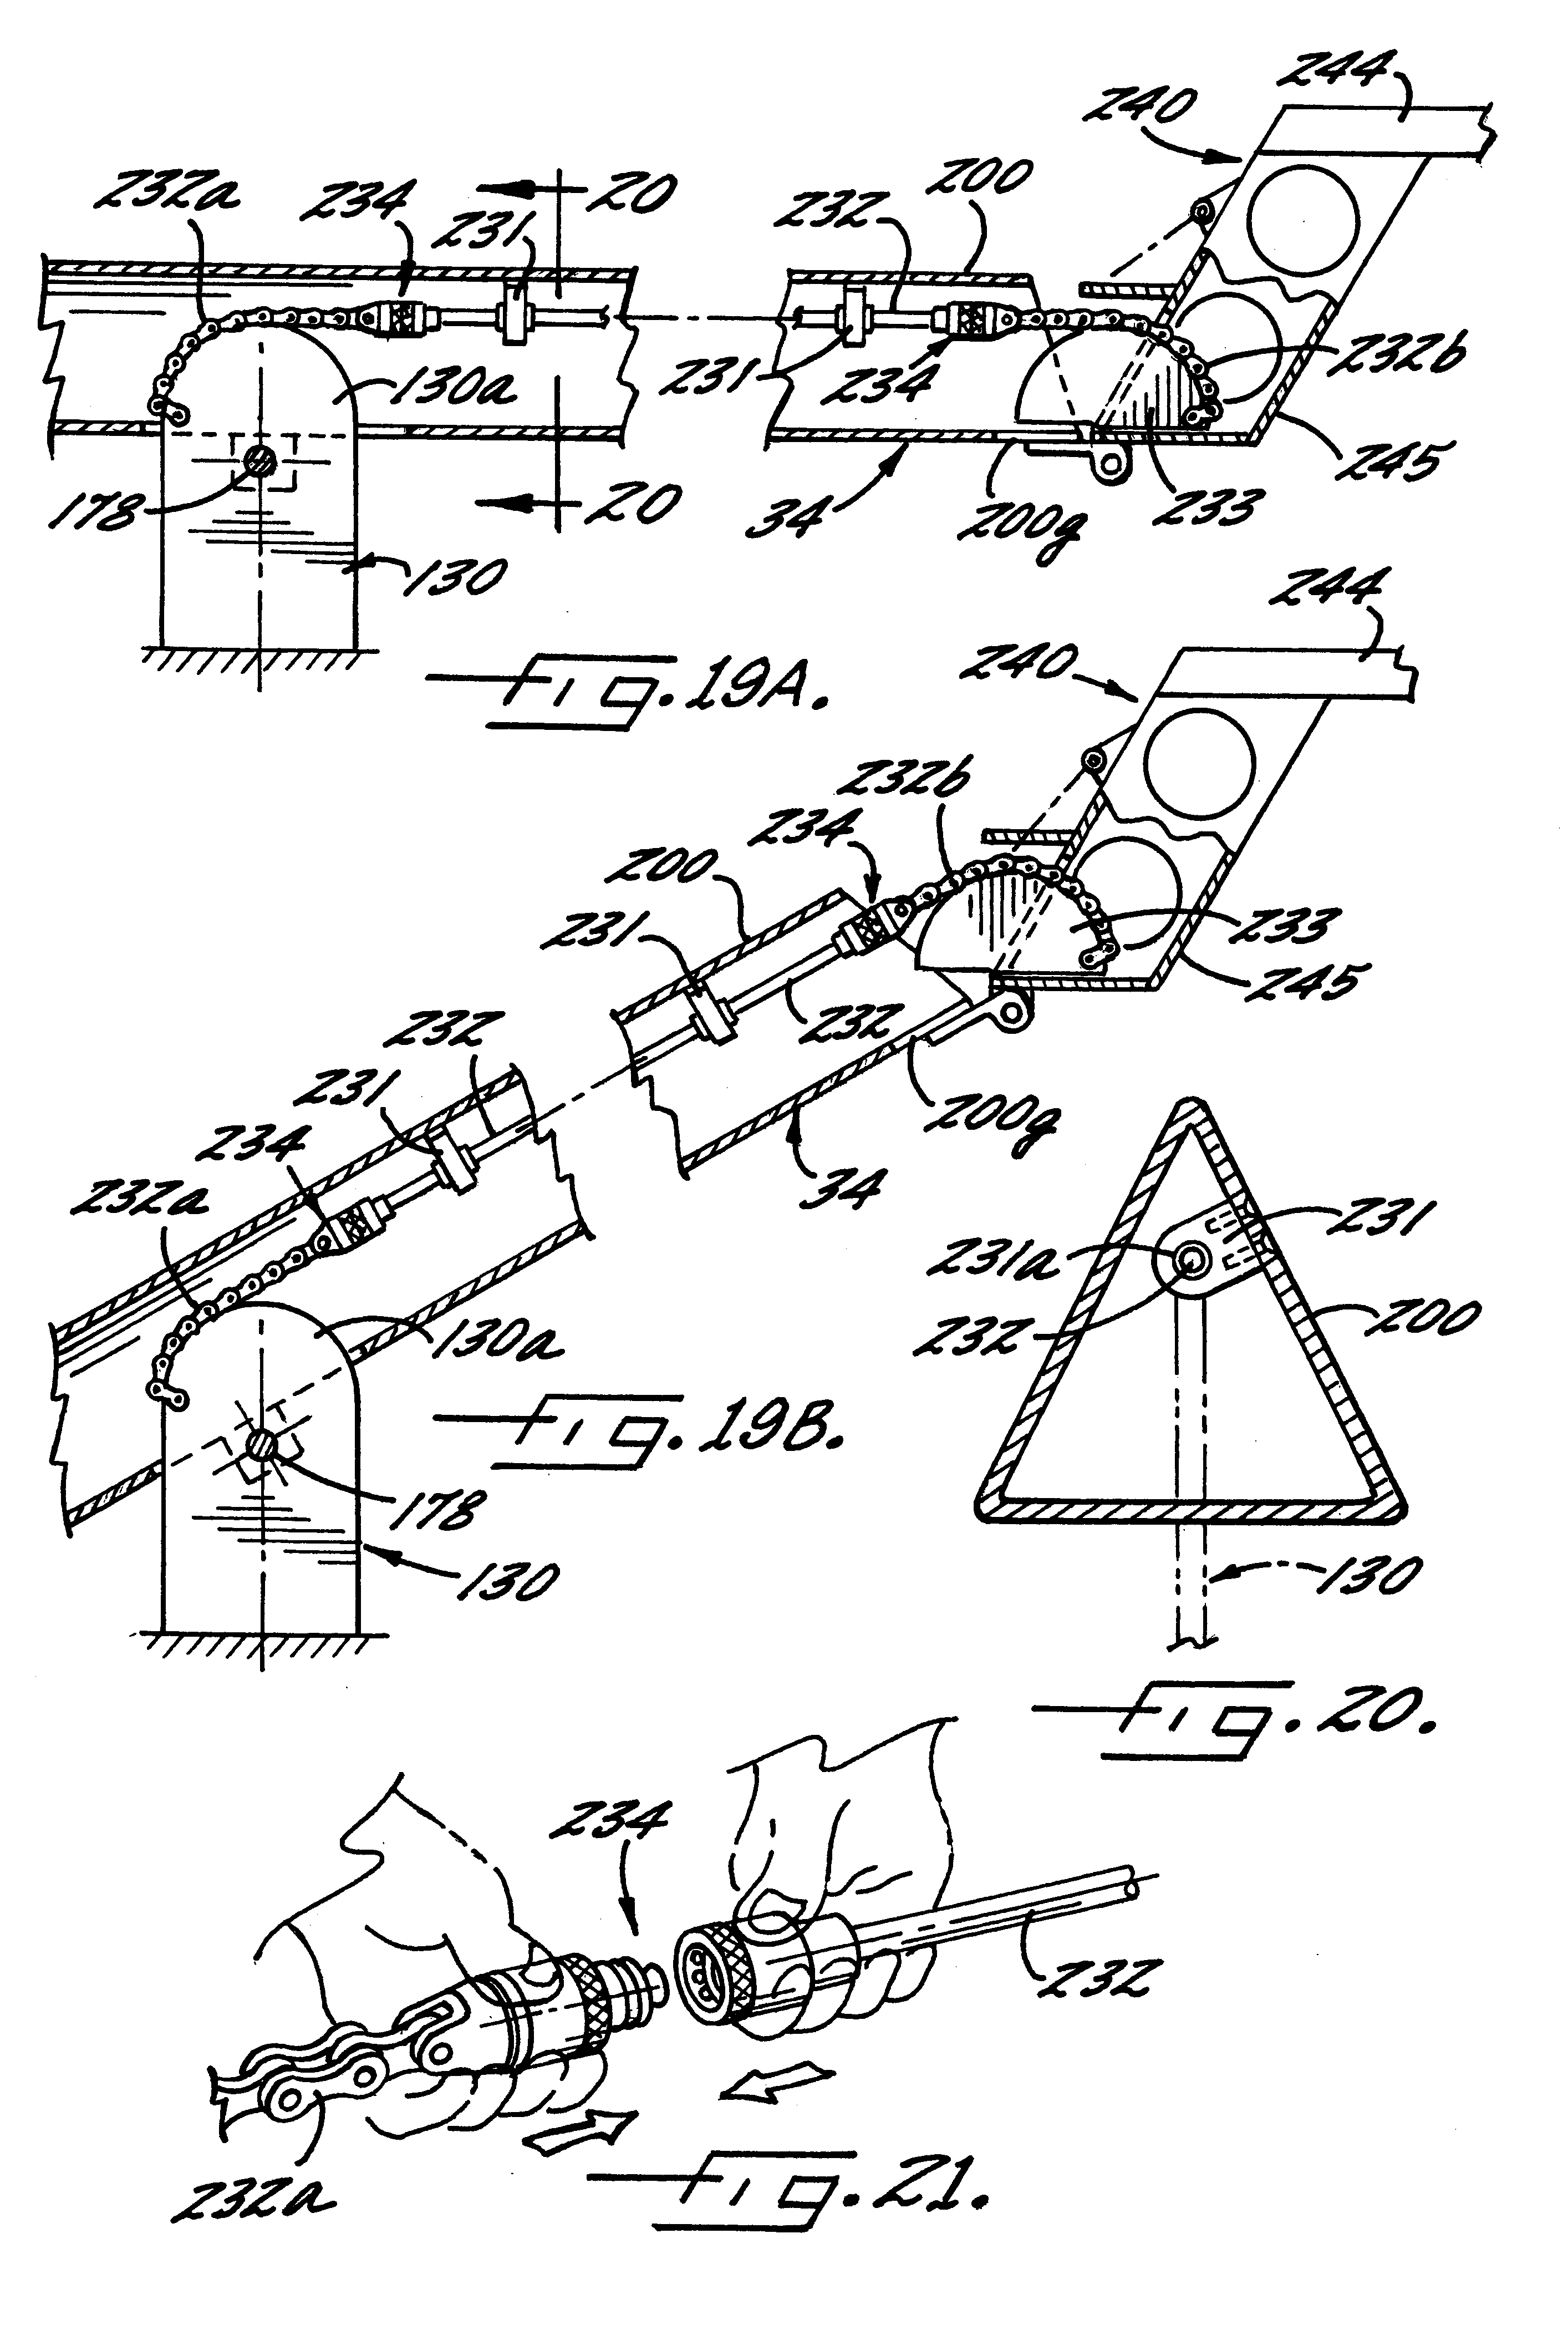 Xo Vision Xd103 Wiring Diagram